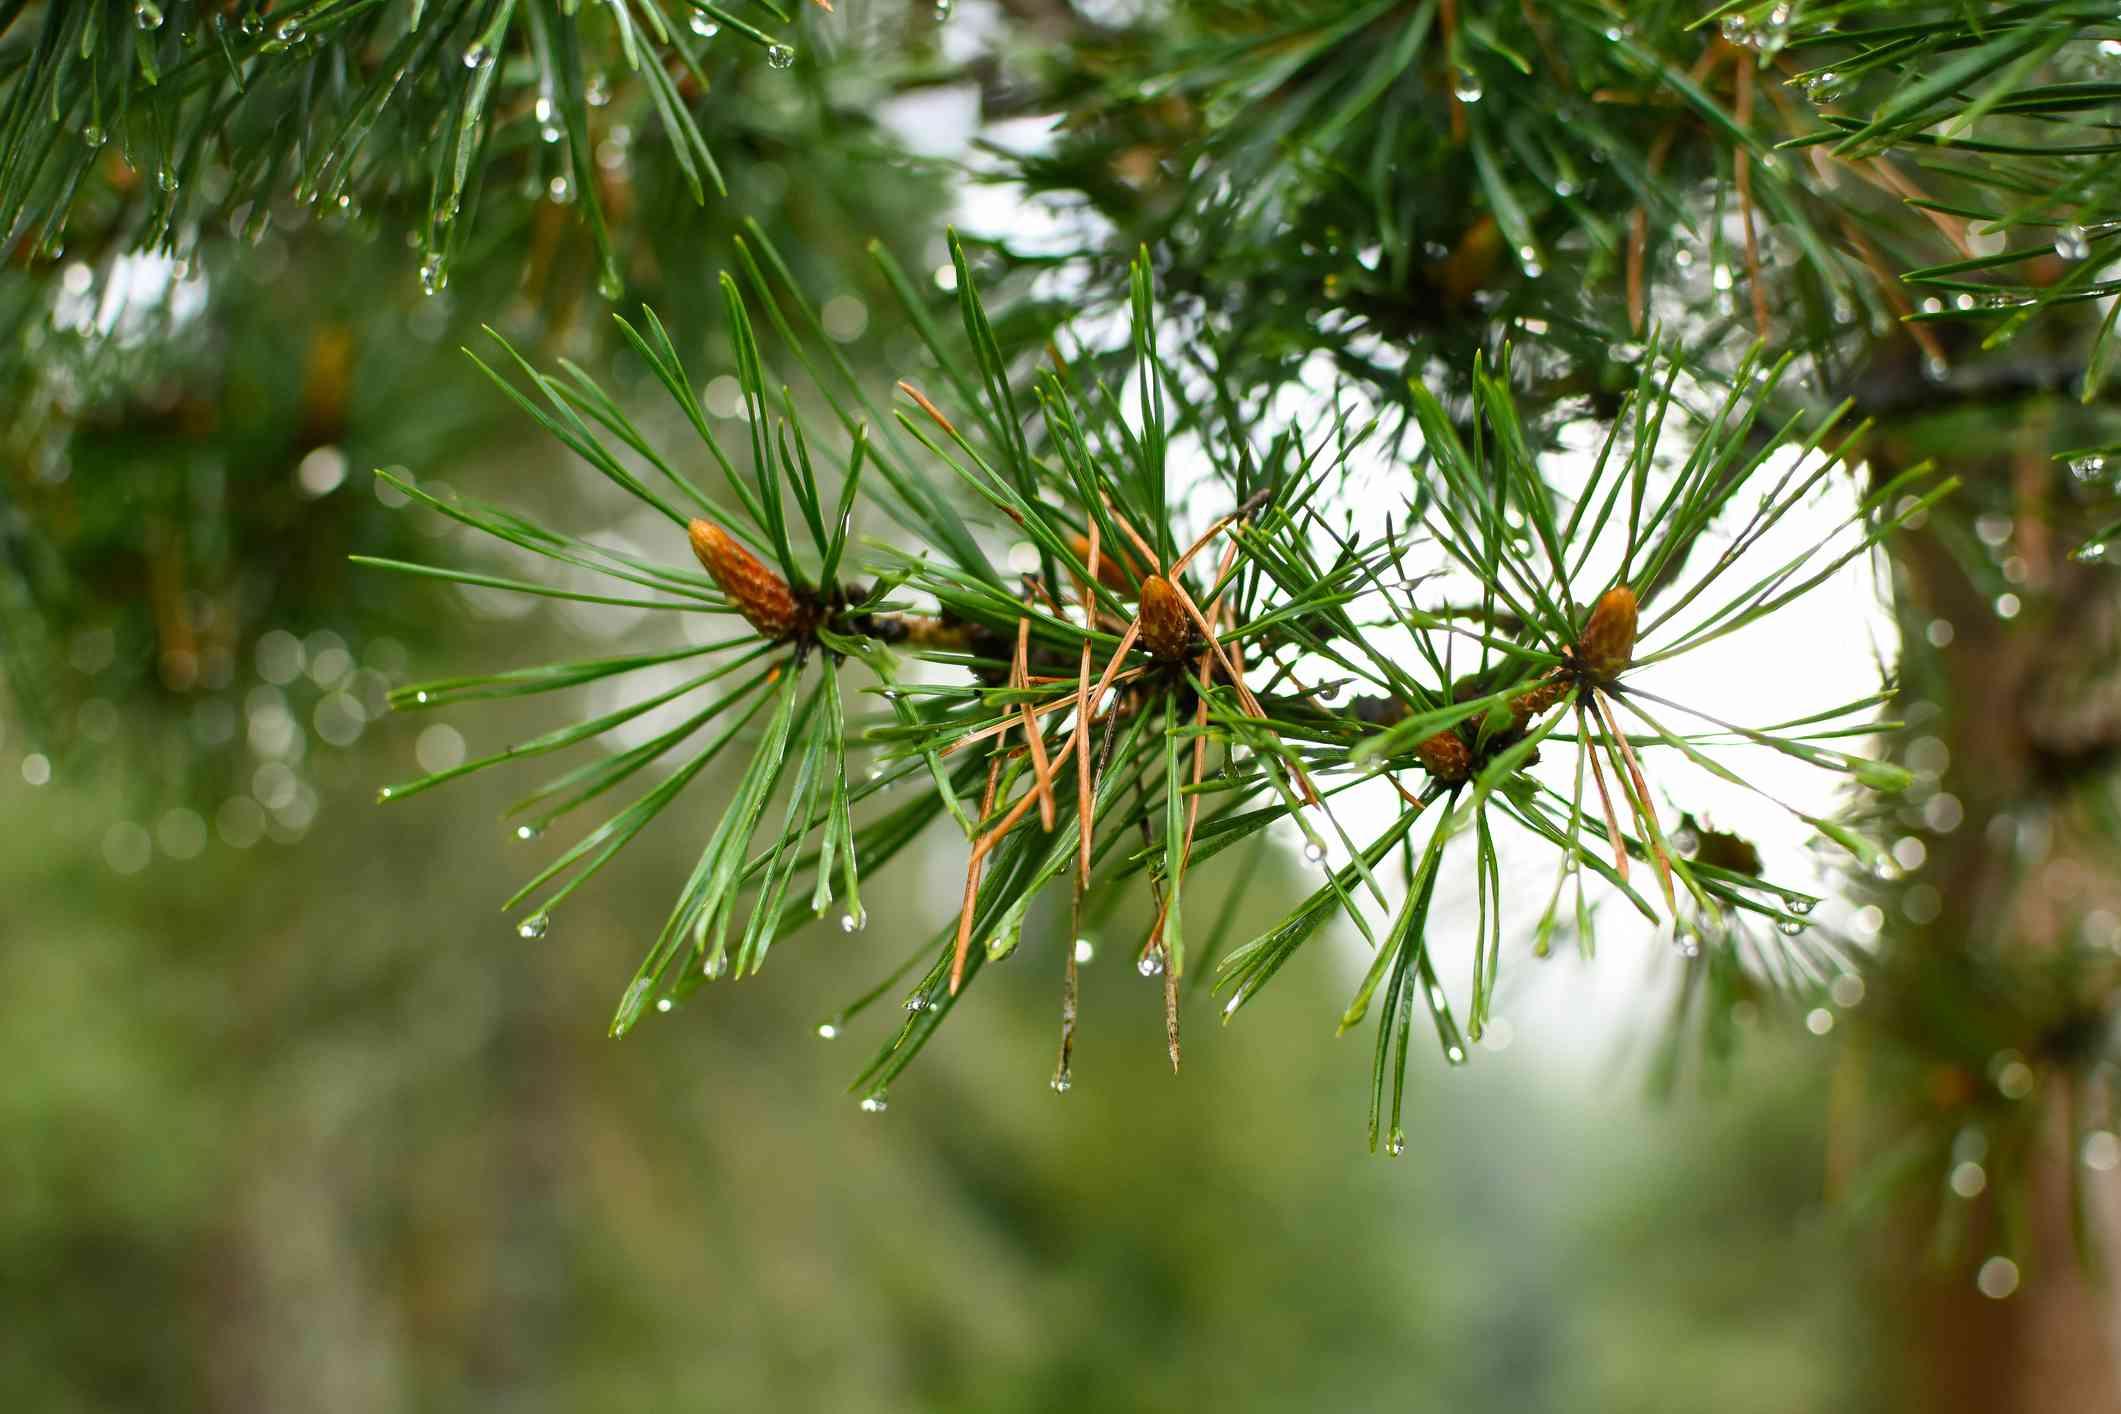 Close-up photo ofshortstraw pine (Pinus virginiana)